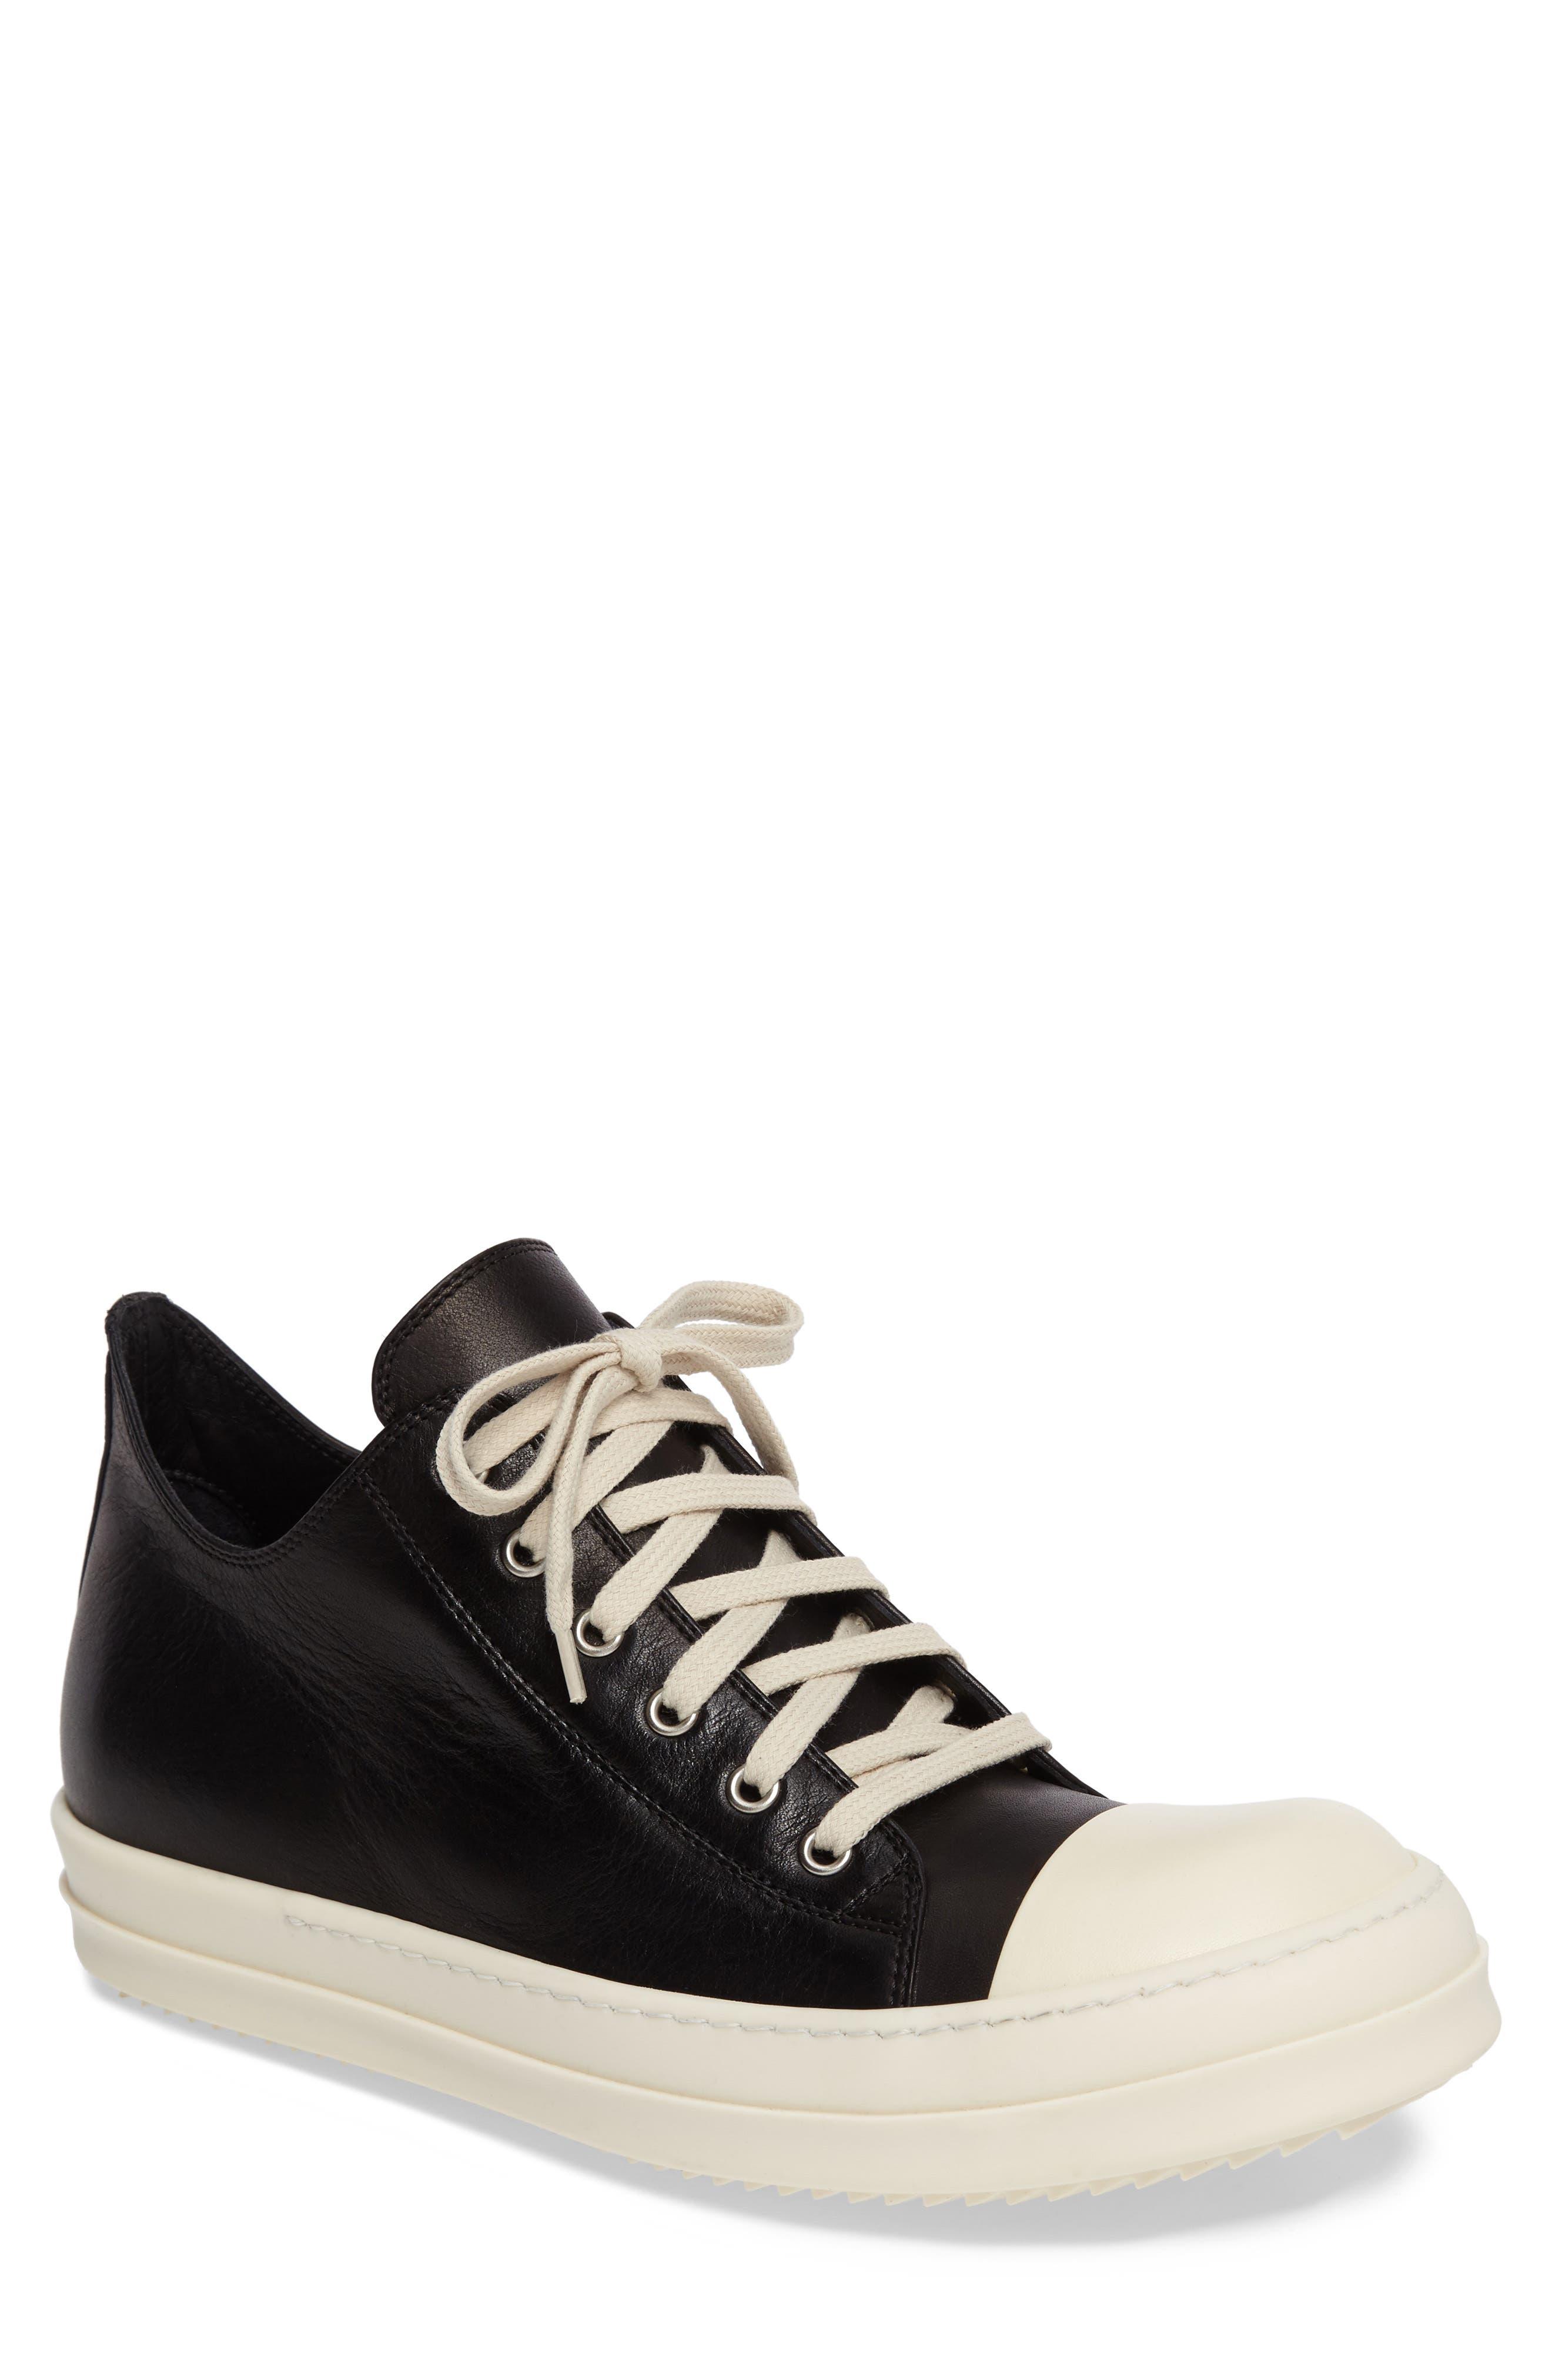 Rick Owens Low Top Sneaker (Men)